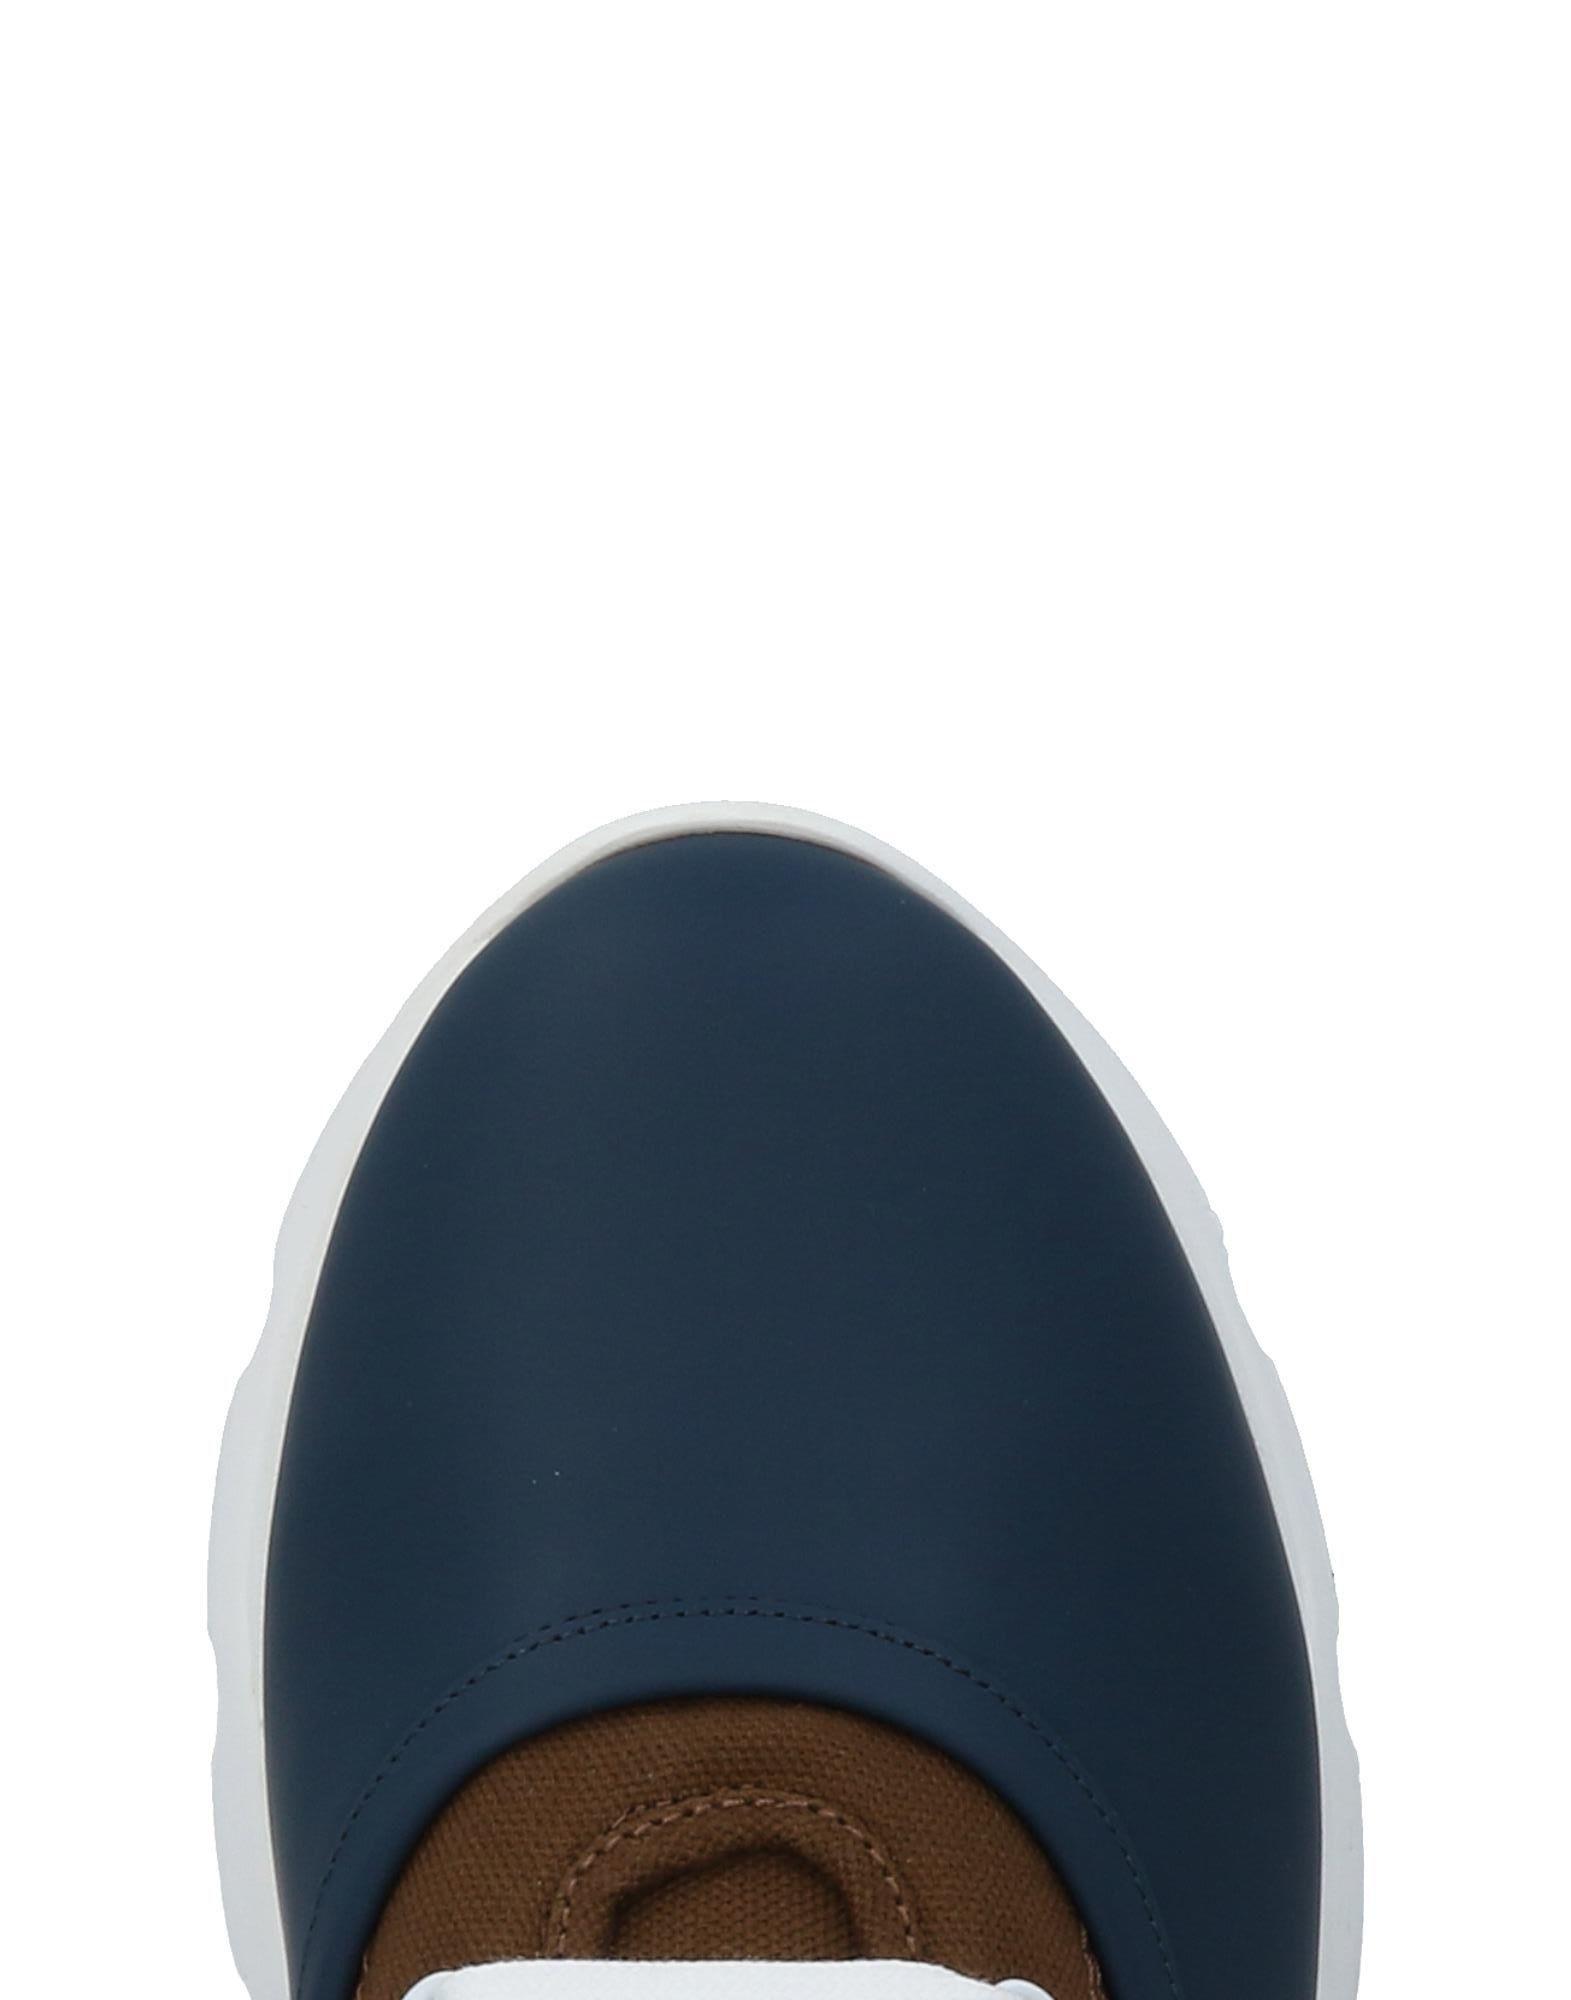 Marni Gute Sneakers Herren  11475803AA Gute Marni Qualität beliebte Schuhe 4c314f